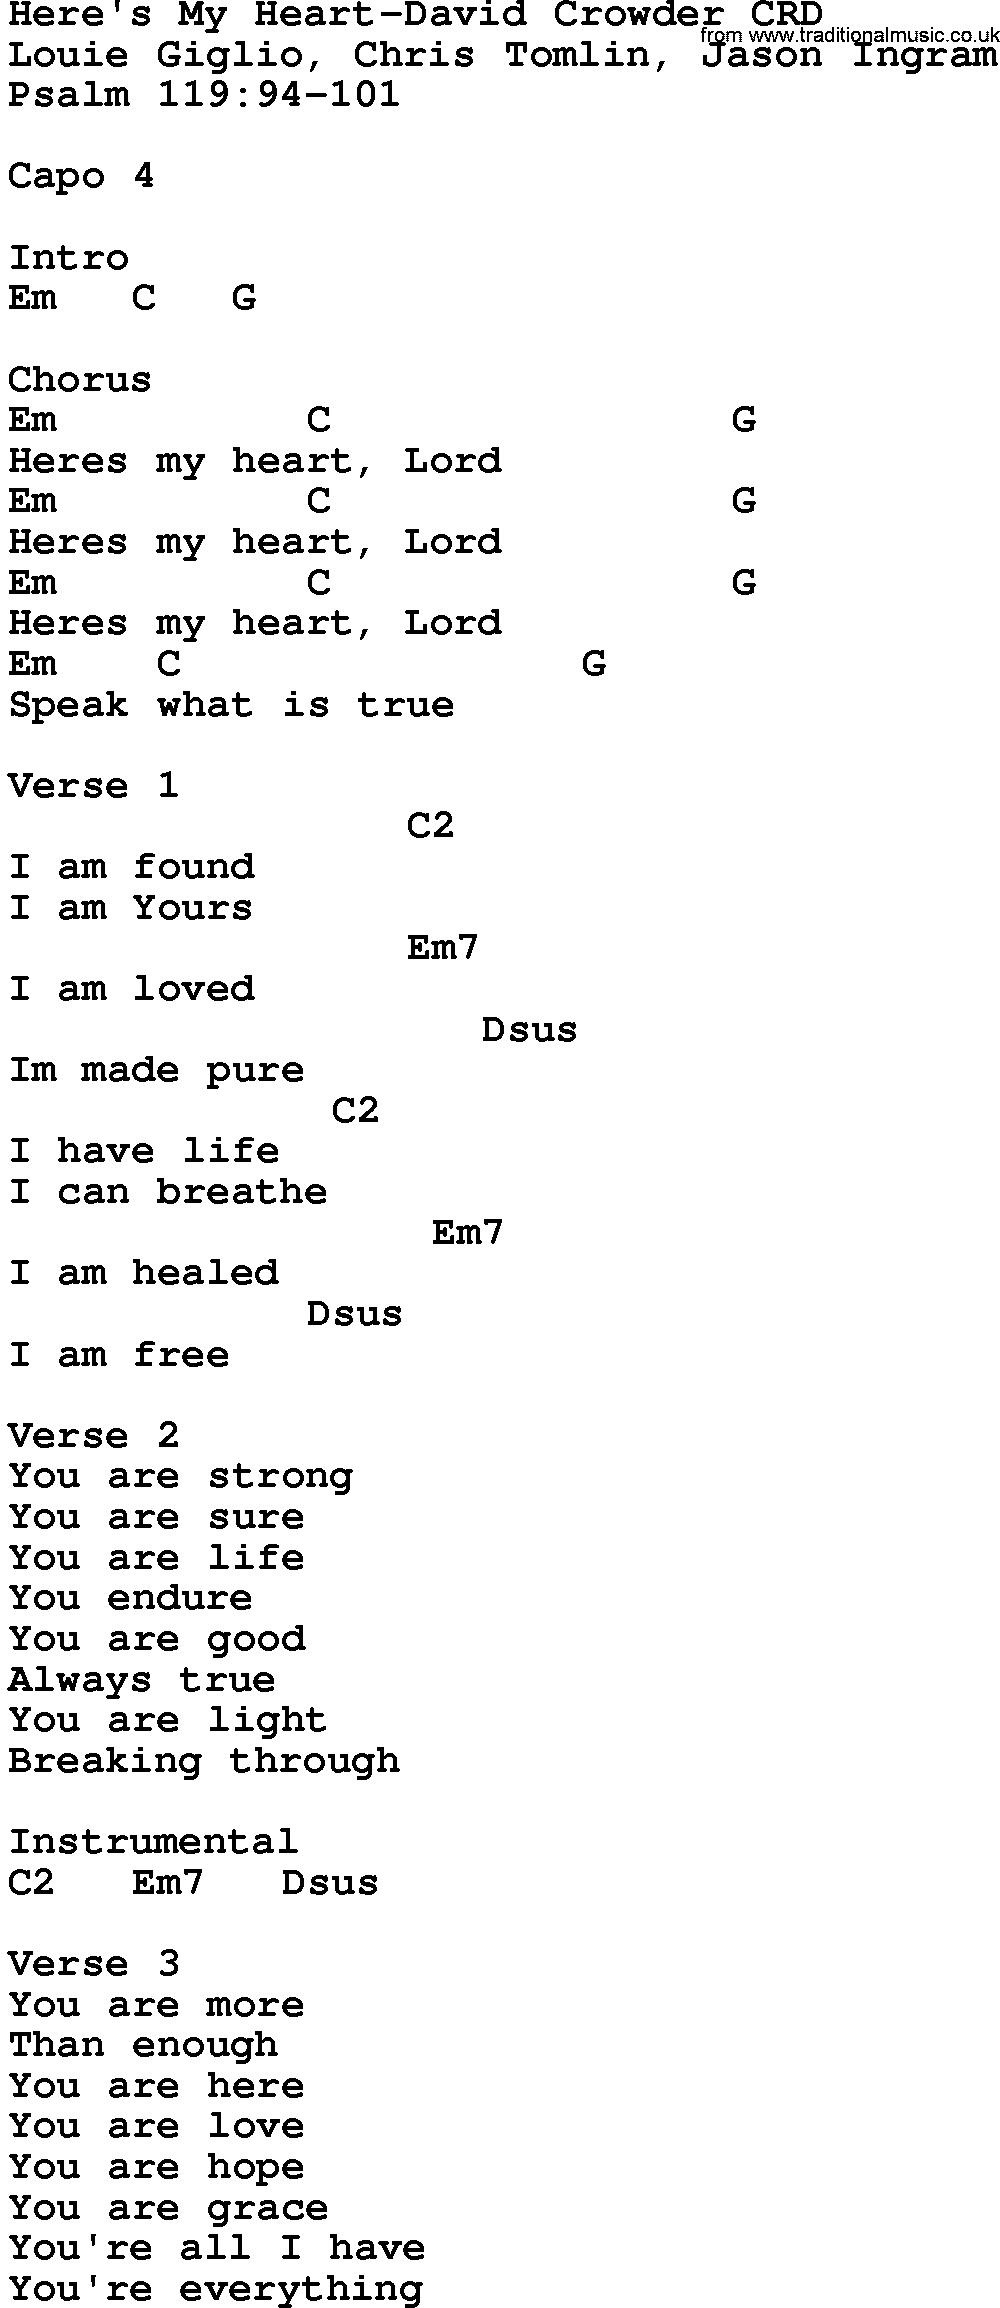 Gospel song heres my heart david crowder lyrics and chords gospel song heres my heart david crowder lyrics and chords hexwebz Image collections